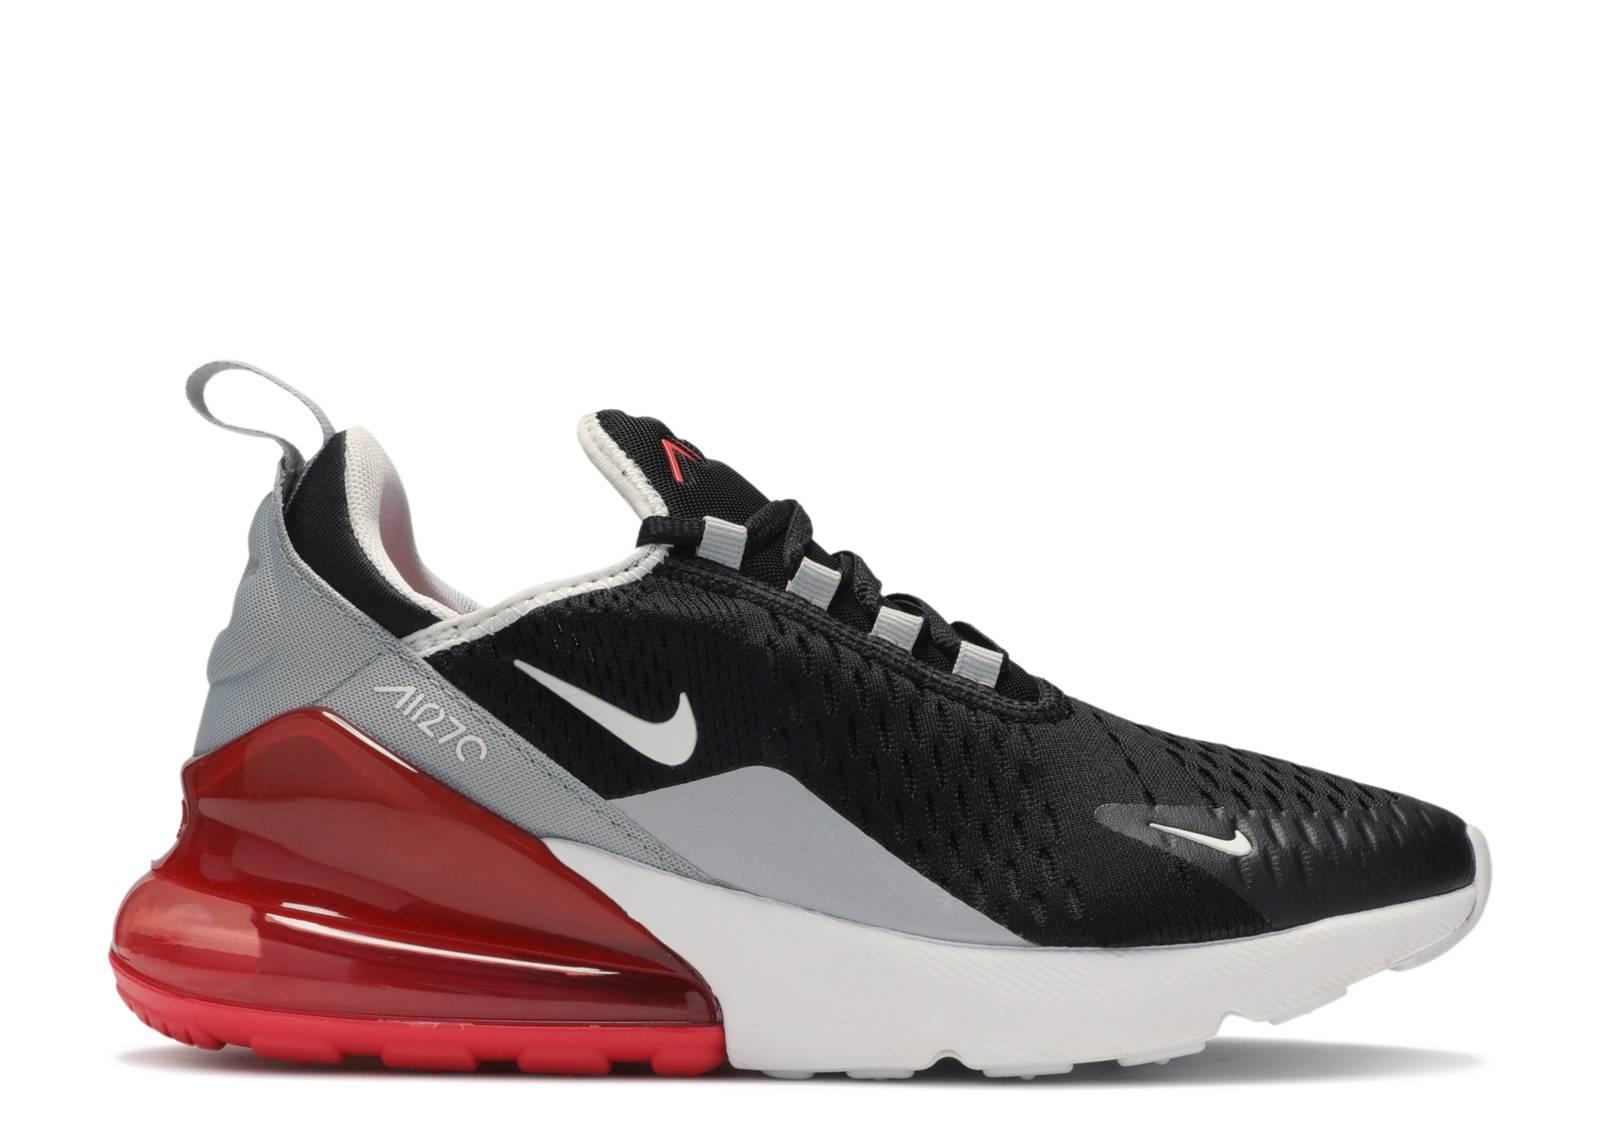 Nike Wmns Air Max Motion LW SE desde 43,90 € | Compara